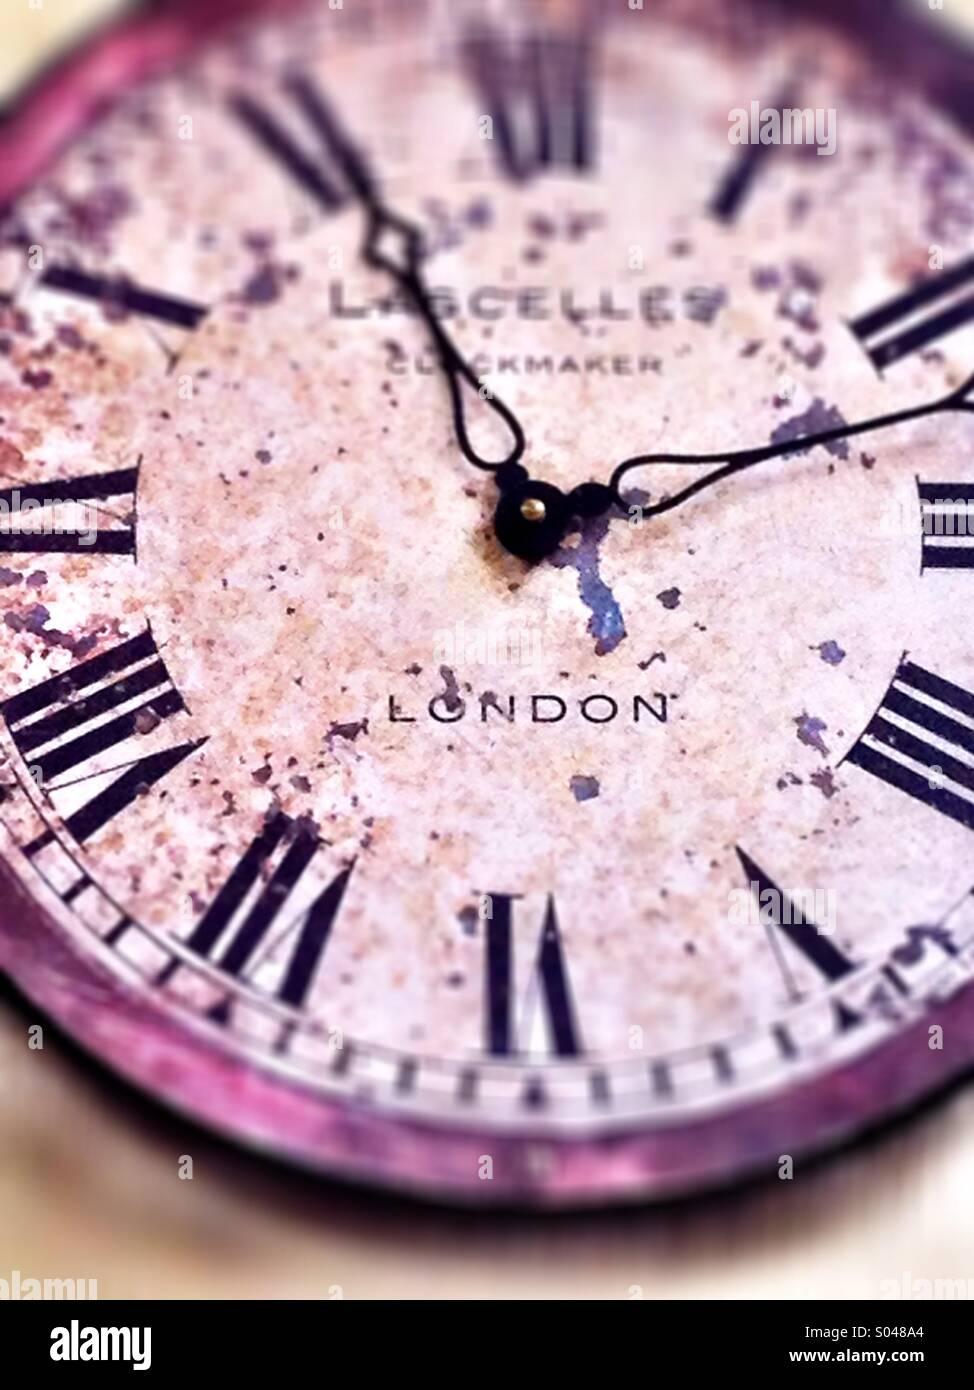 London Time - Stock Image